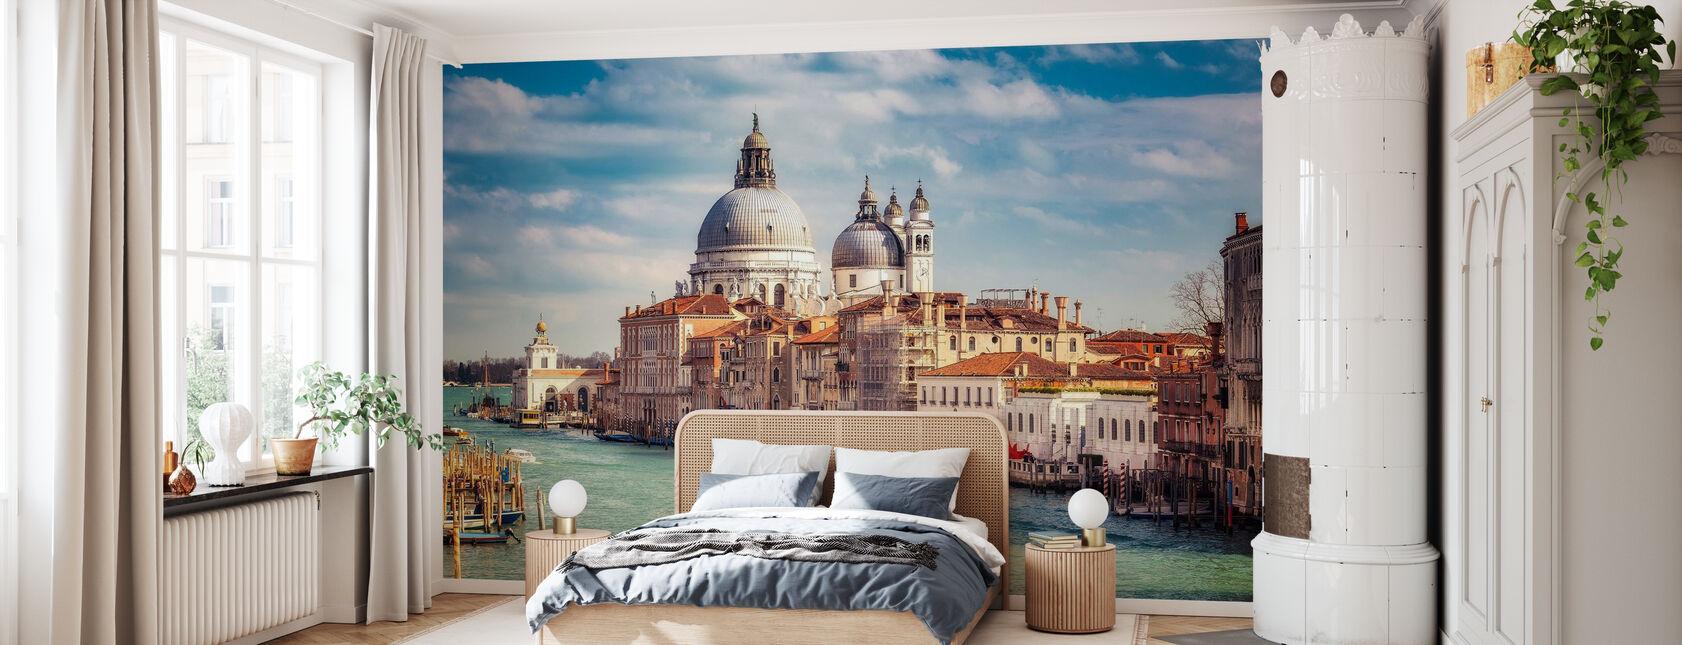 Basilica Santa Maria della Salute in Venice - Wallpaper - Bedroom